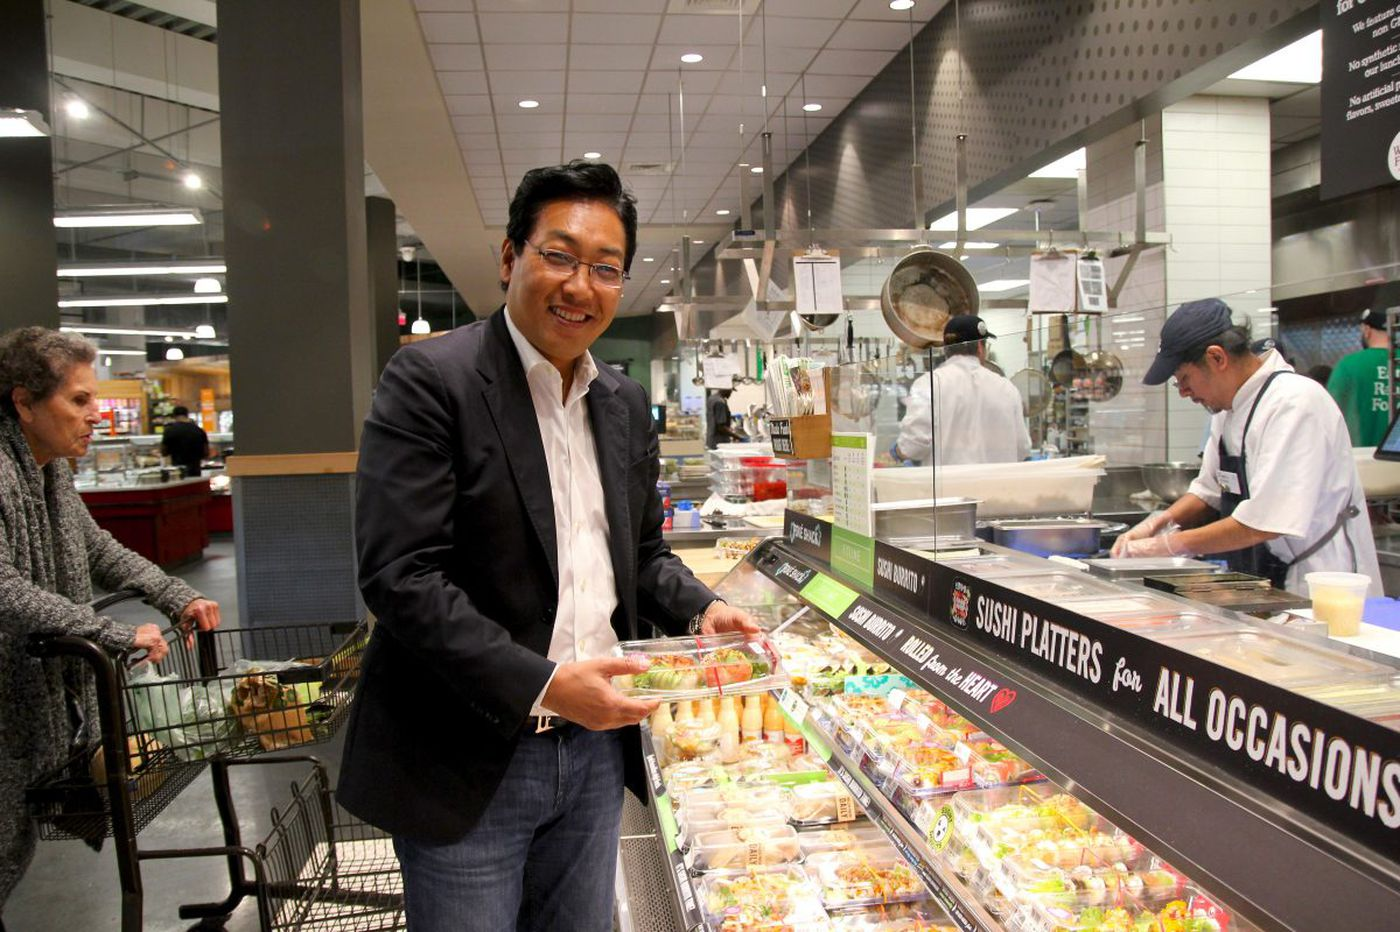 Why Philadelphia is the sushi capital of America